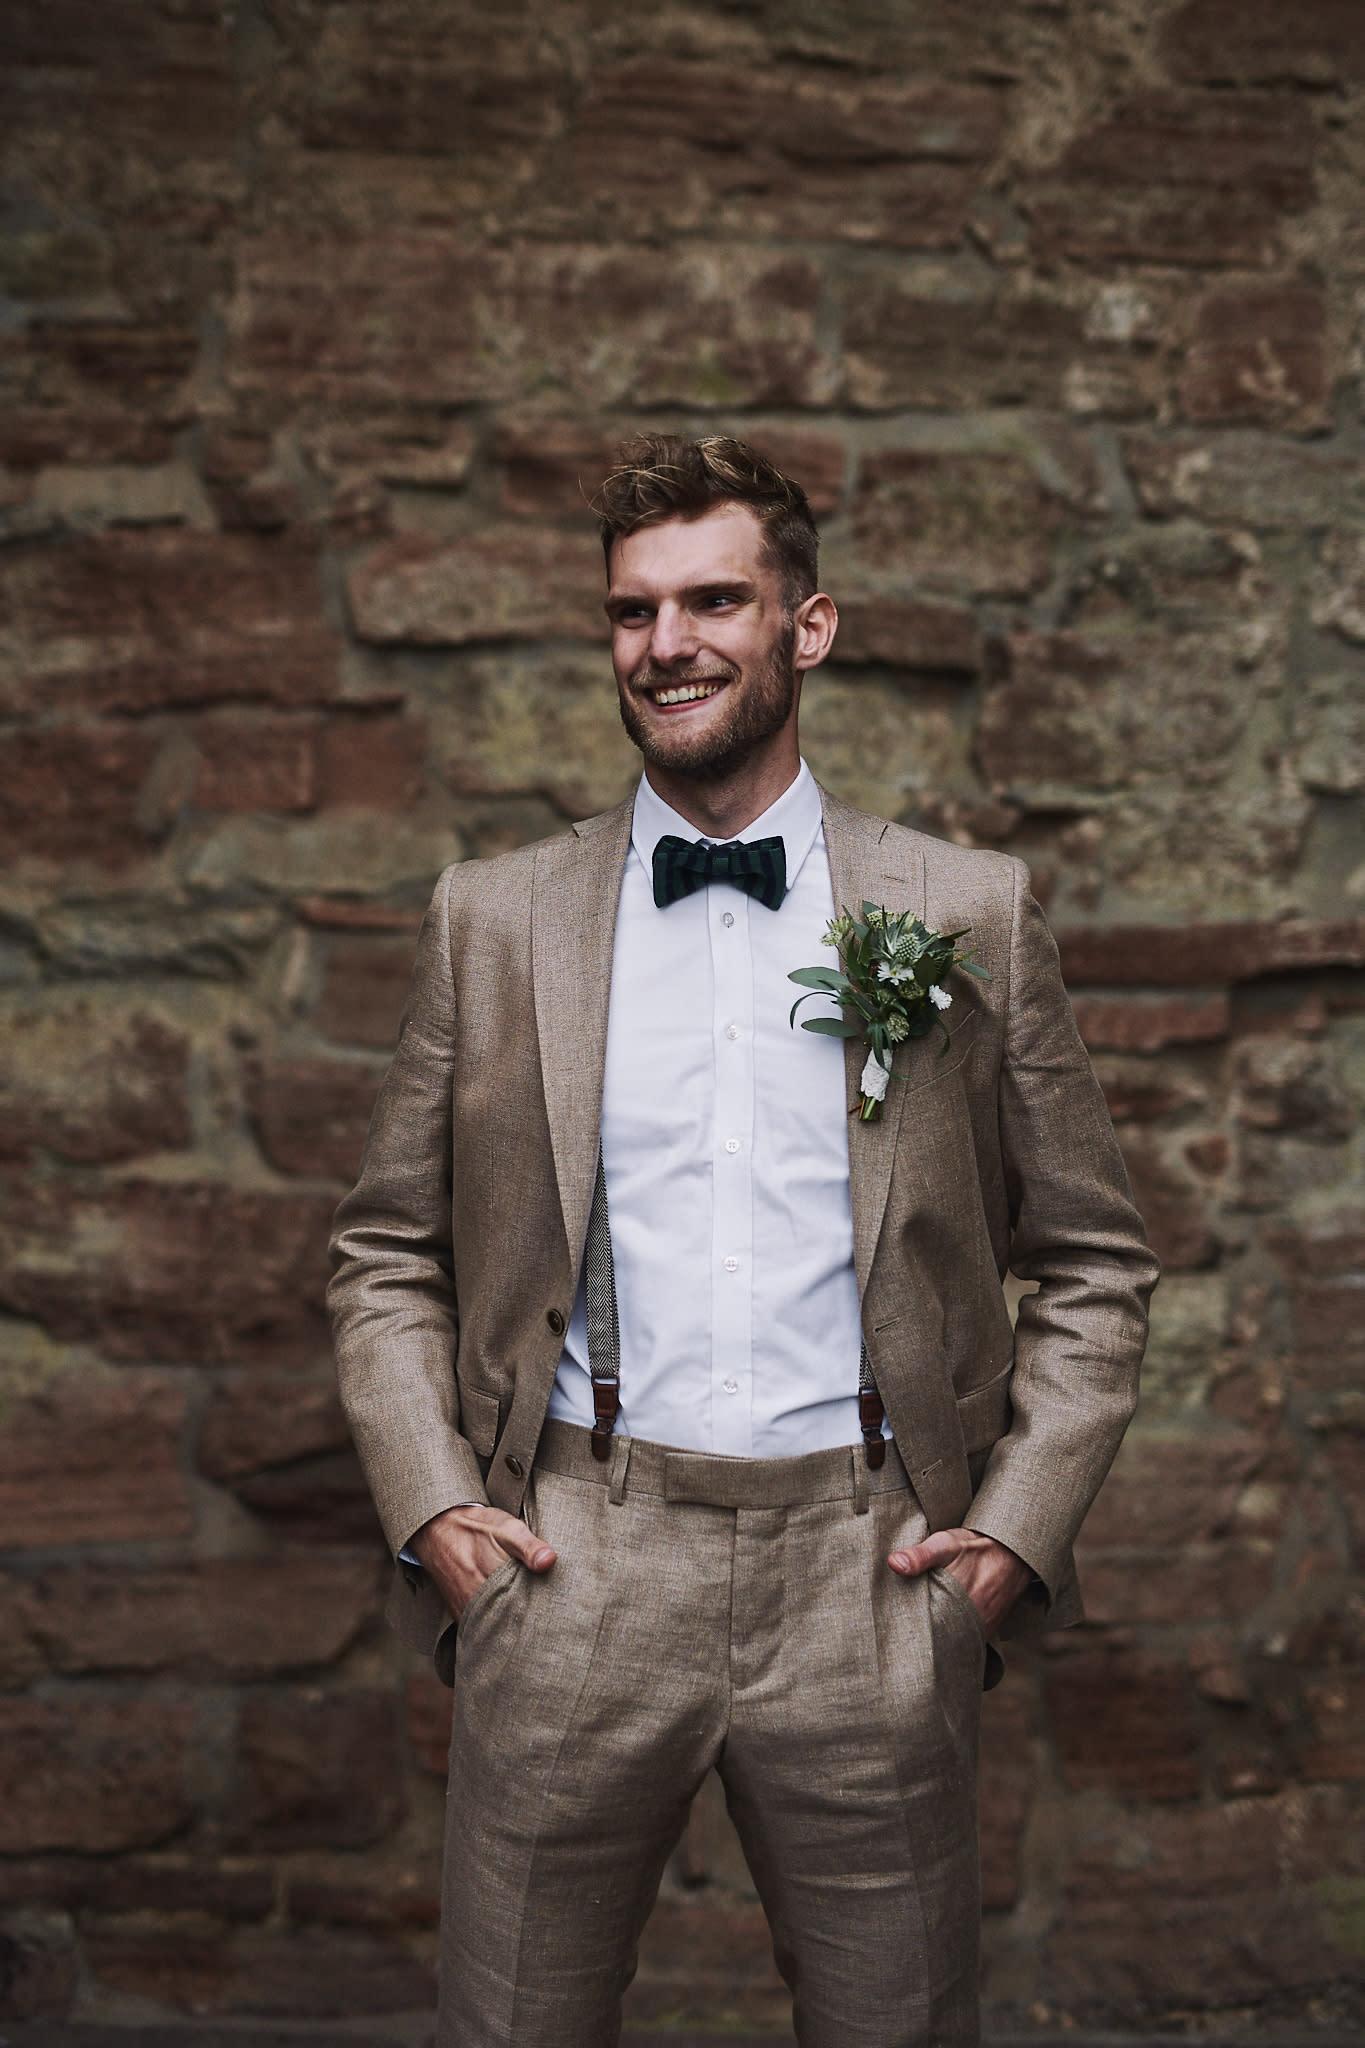 bröllop+öland+elopement+kostym